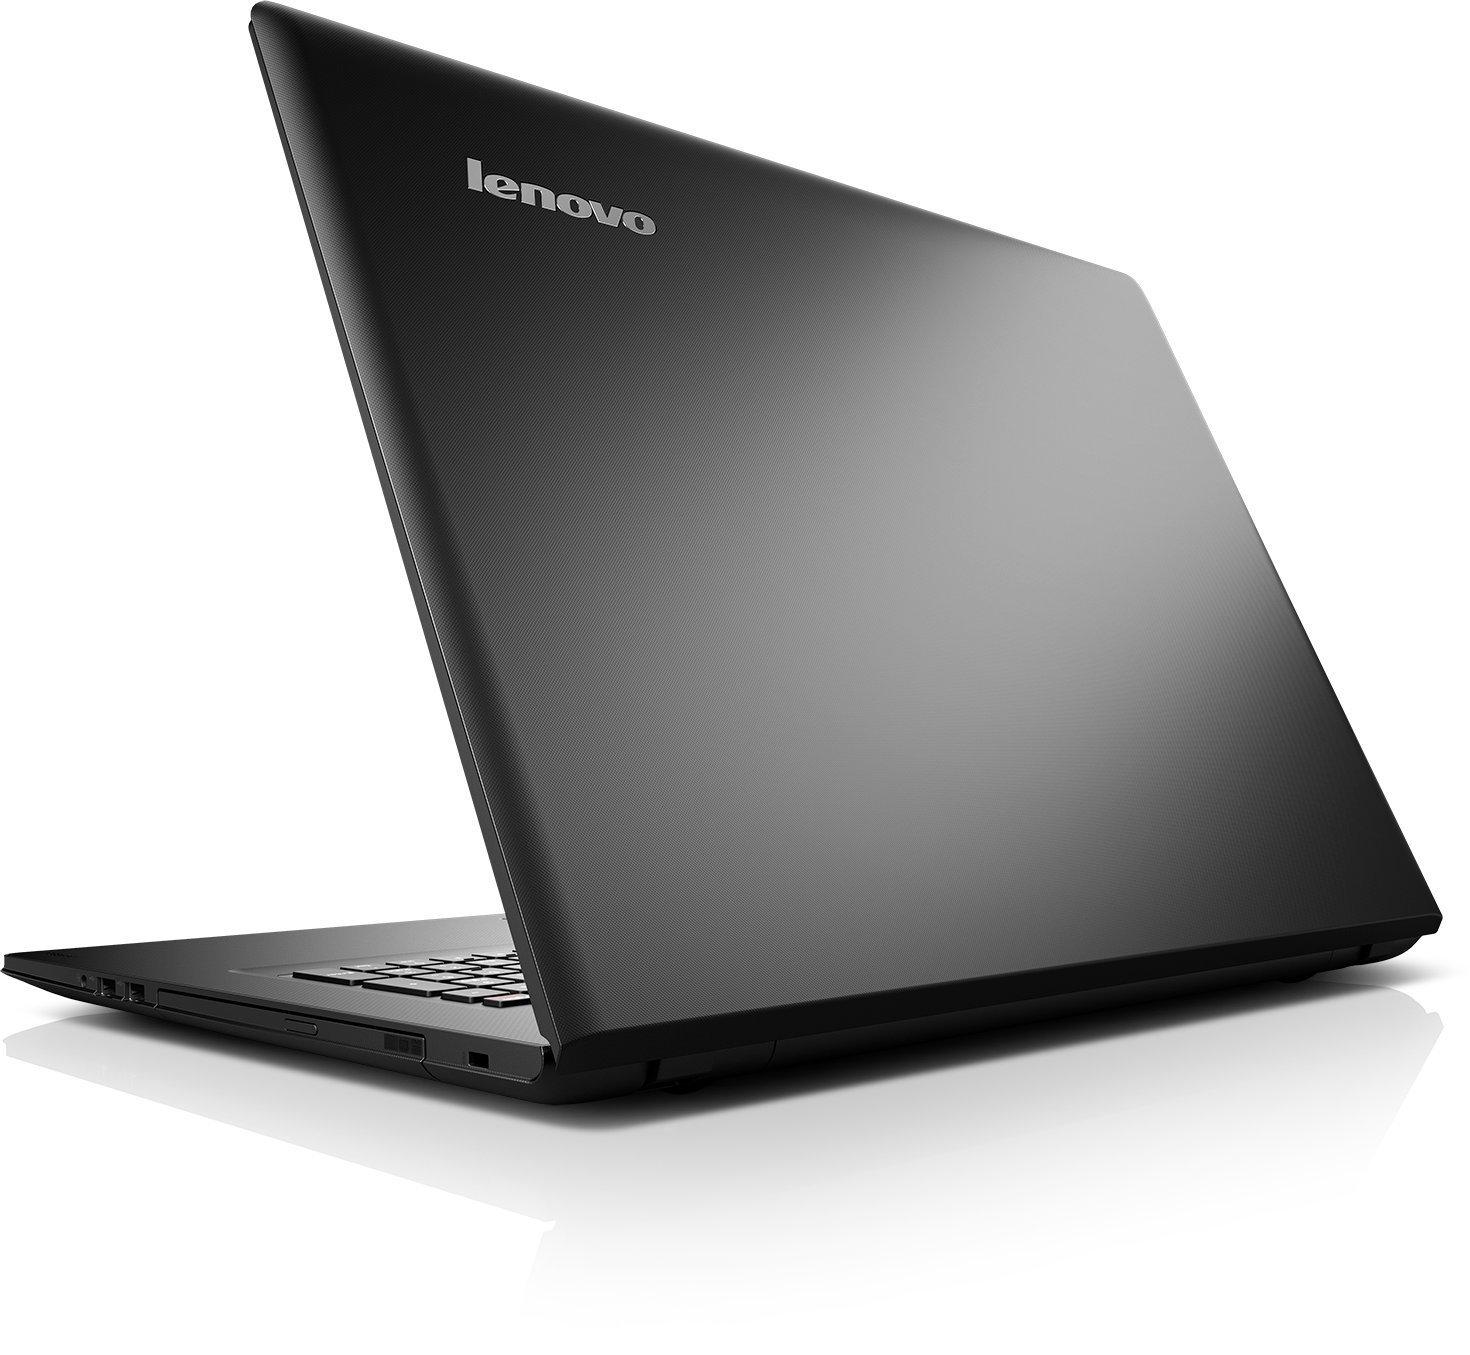 Lenovo Ideapad 110 14isk Ram 4gb Intel Core I5 6200u Amd R5 M330 2gb 305 Win10 I3 5005 14 Silver Full Resolution